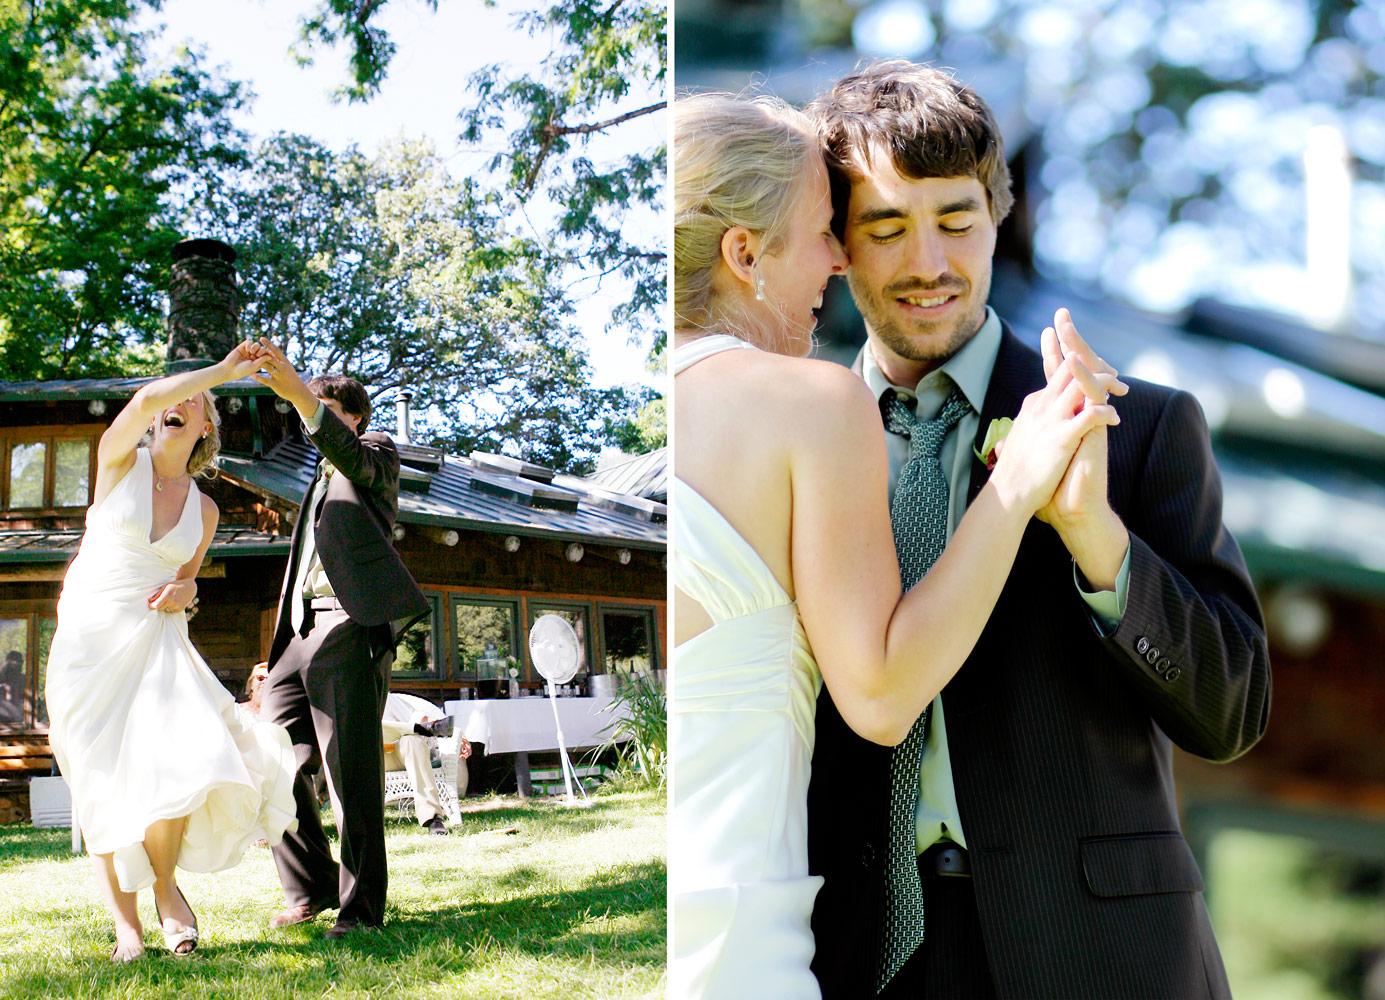 rustic-outdoor-trinity-river-wedding-ruthie-hauge-photography-24.jpg